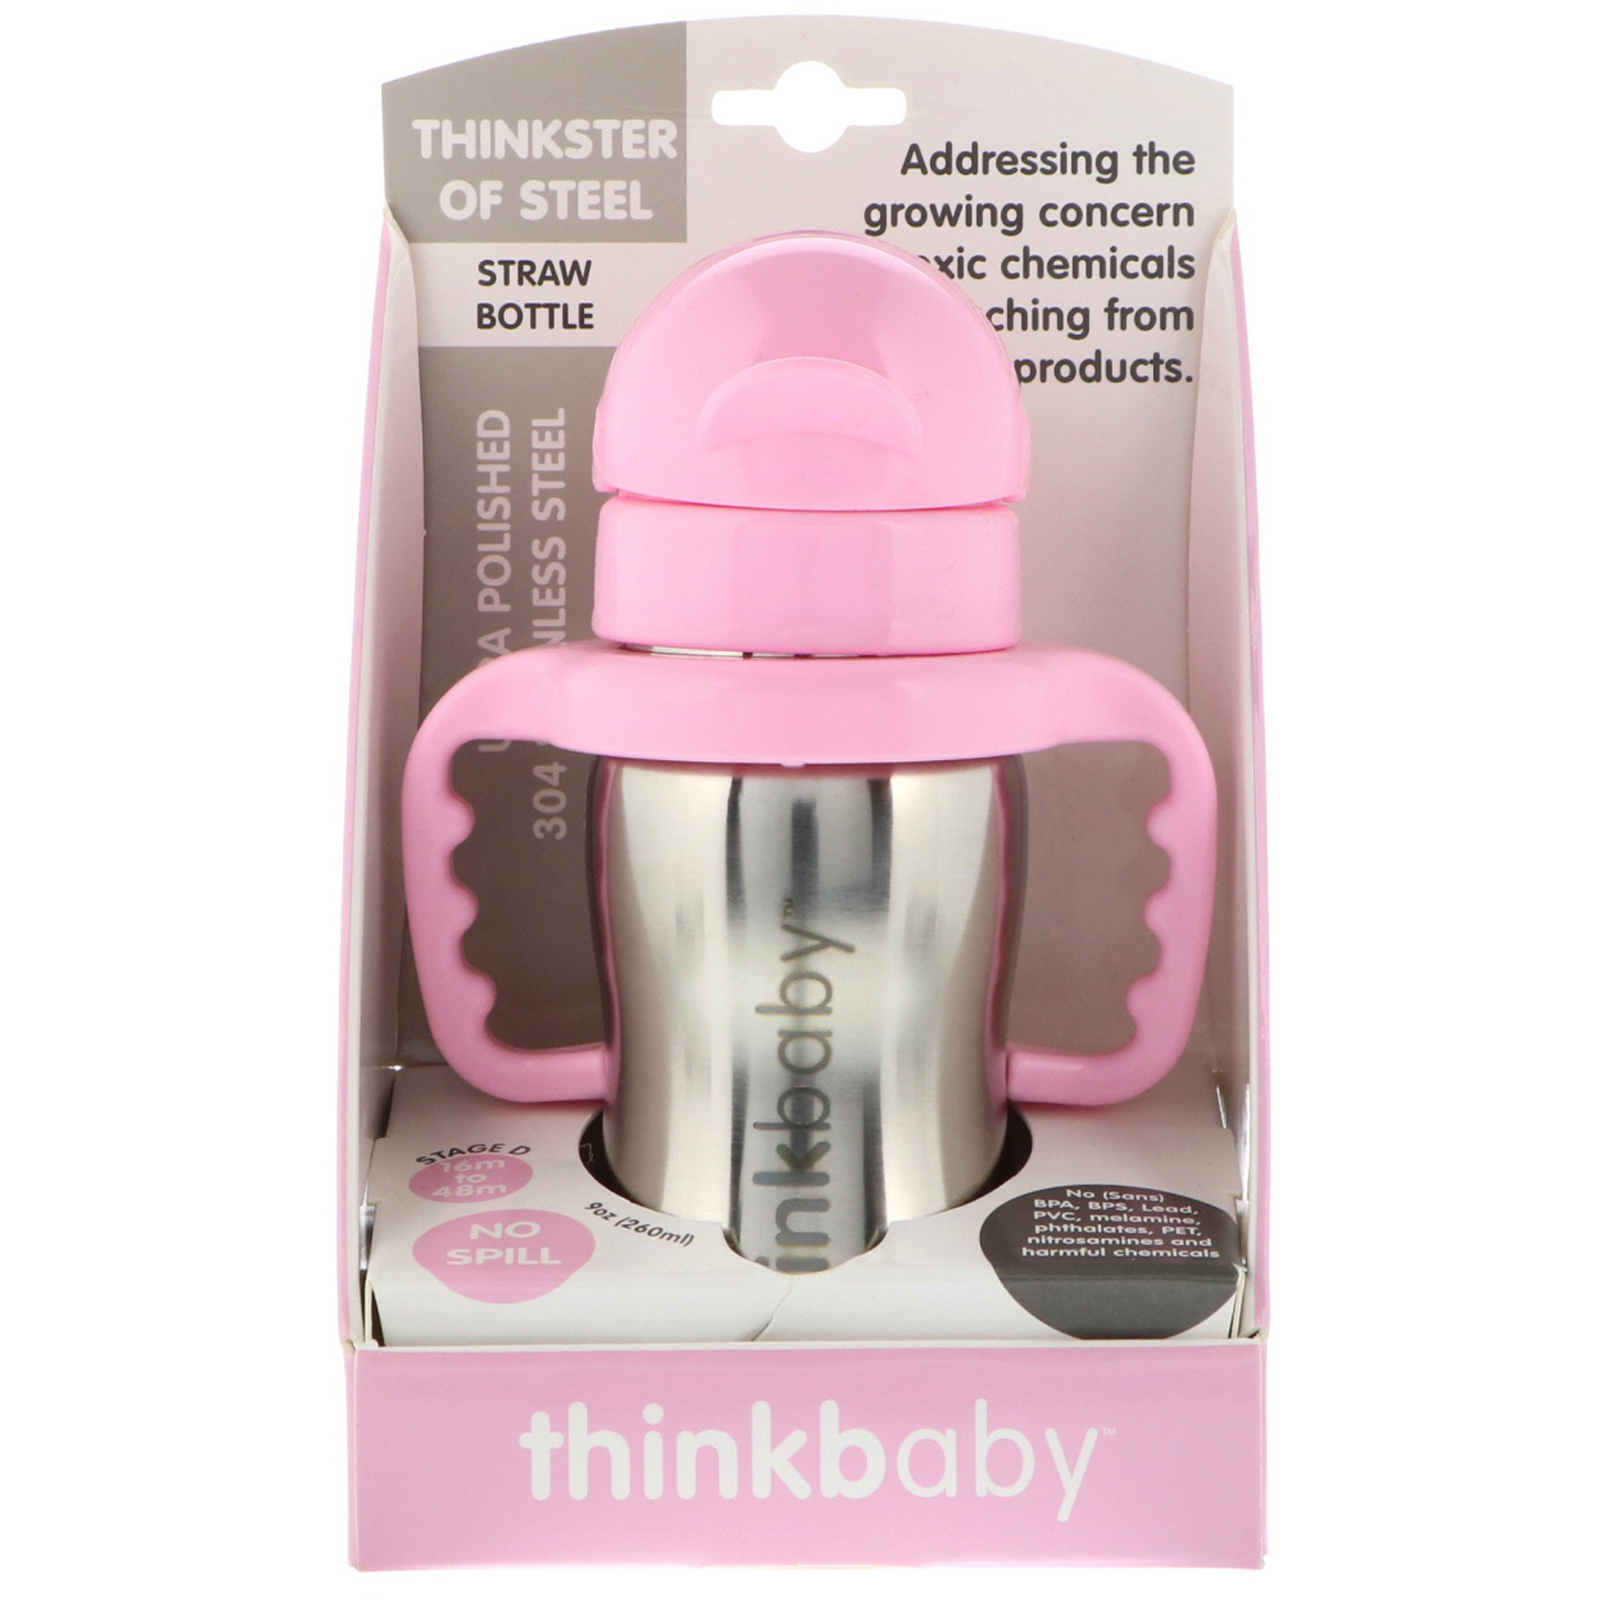 thinkbaby Thinkster Straw Bottle Pink